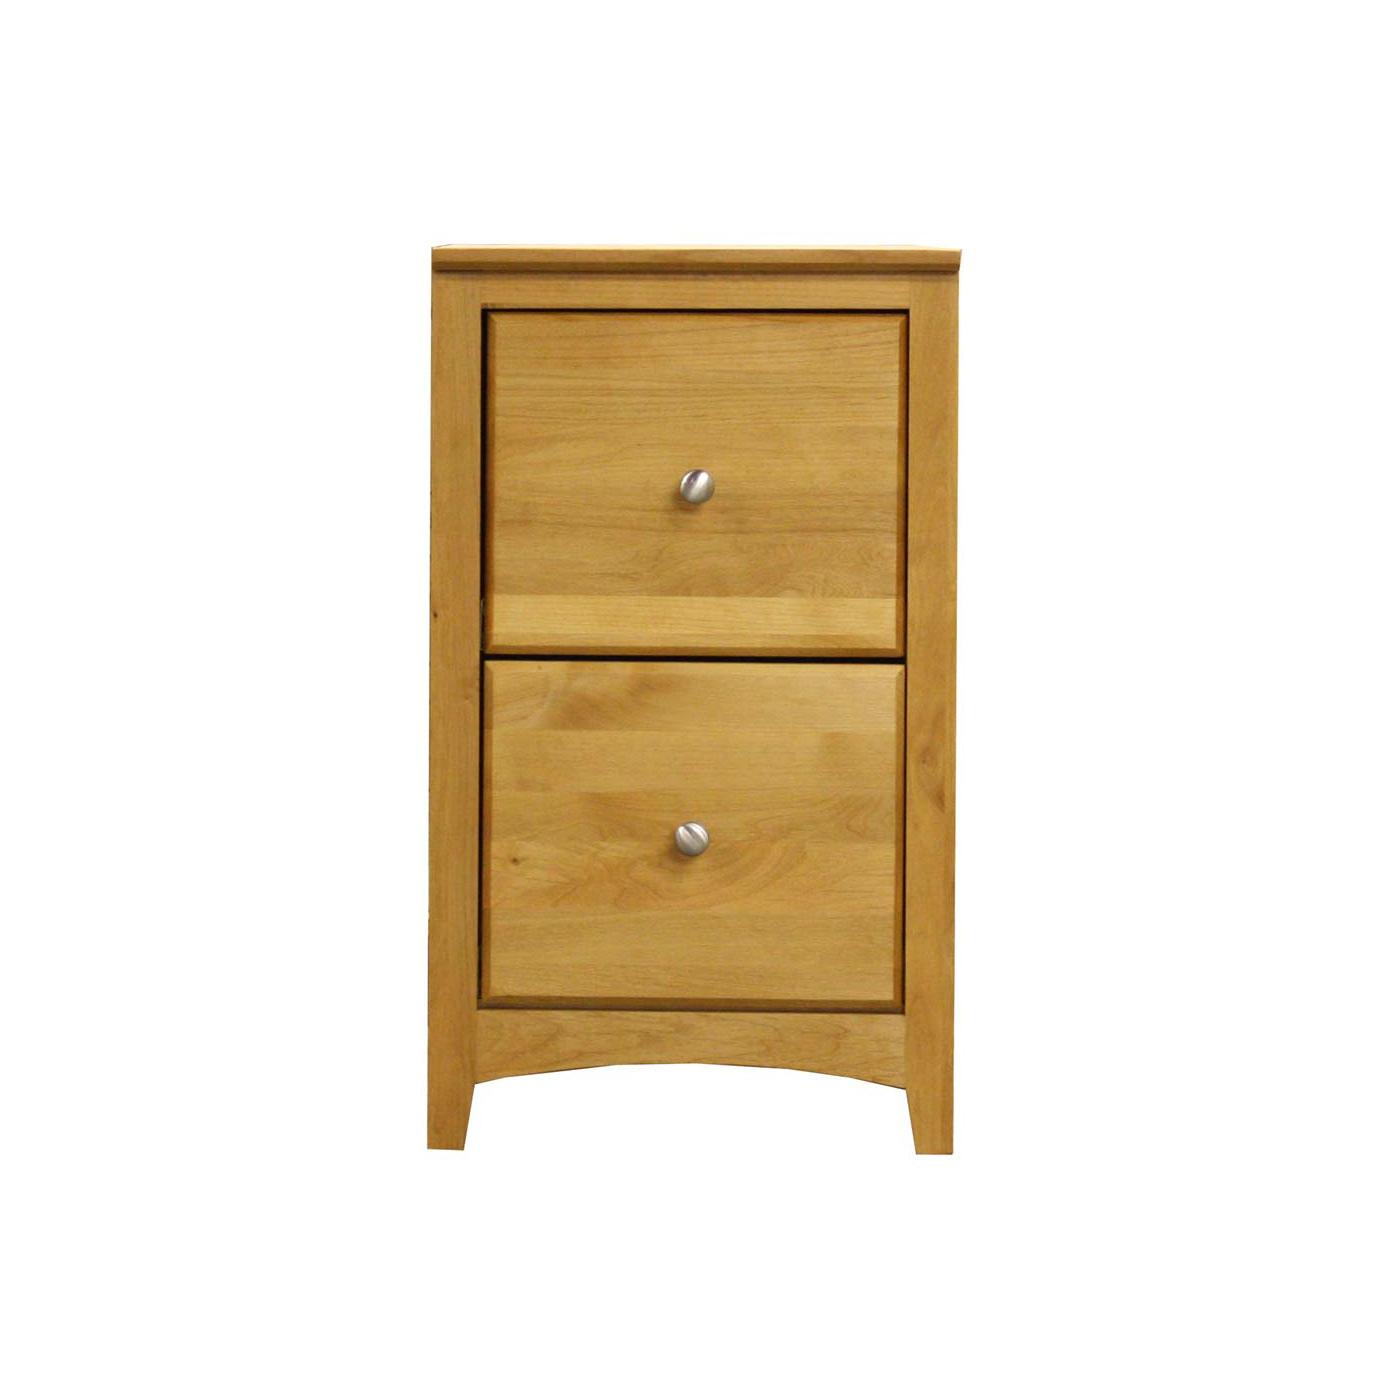 Archbold - Shaker 2 drawer vertical file cabinet modular office - Finished.jpg